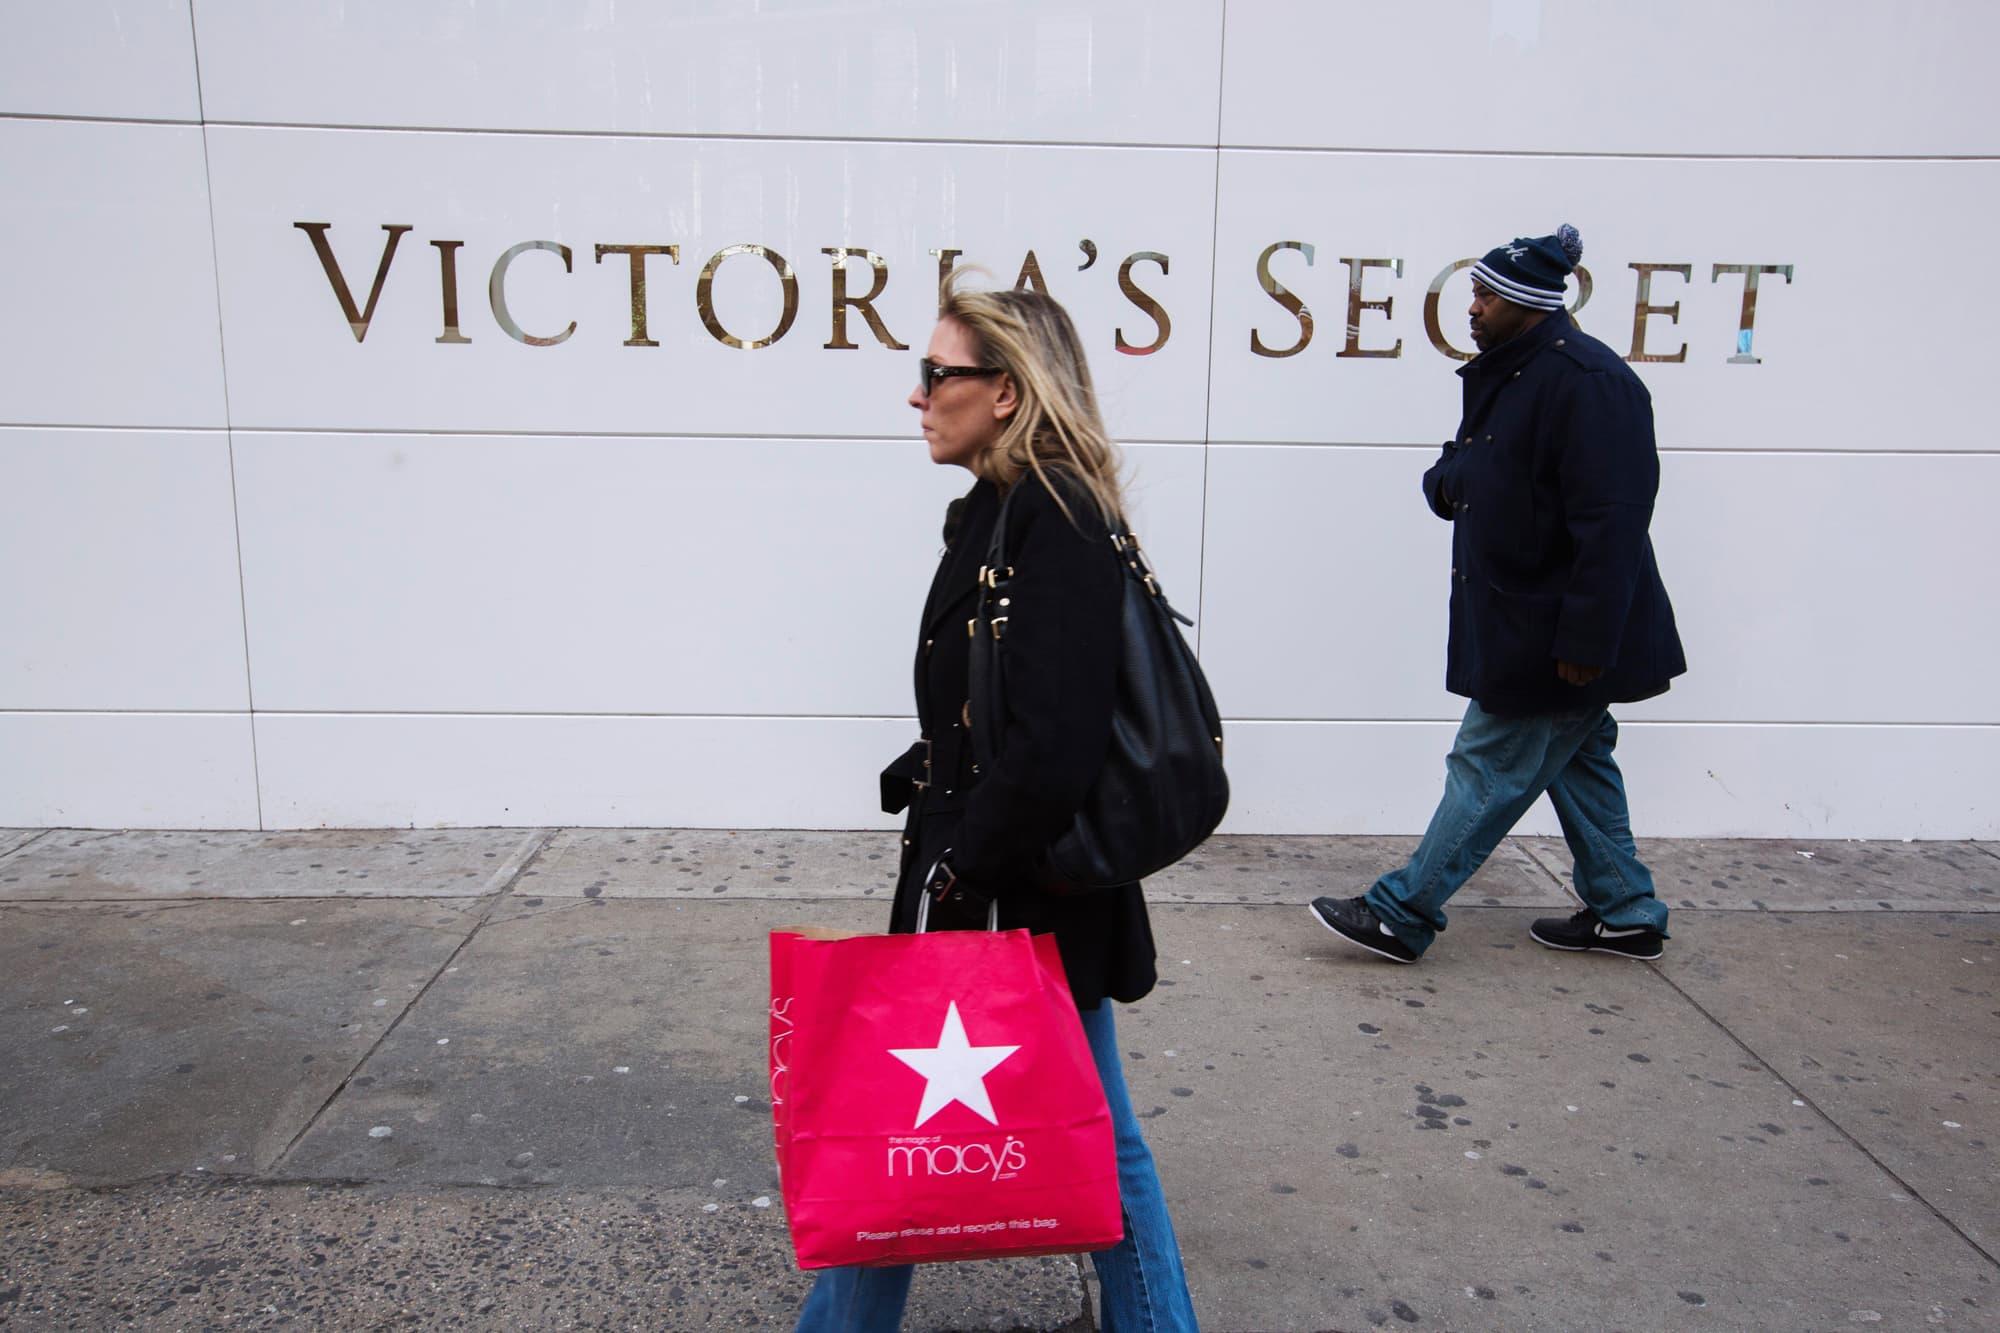 Reusable: Victoria's secret store people walk by